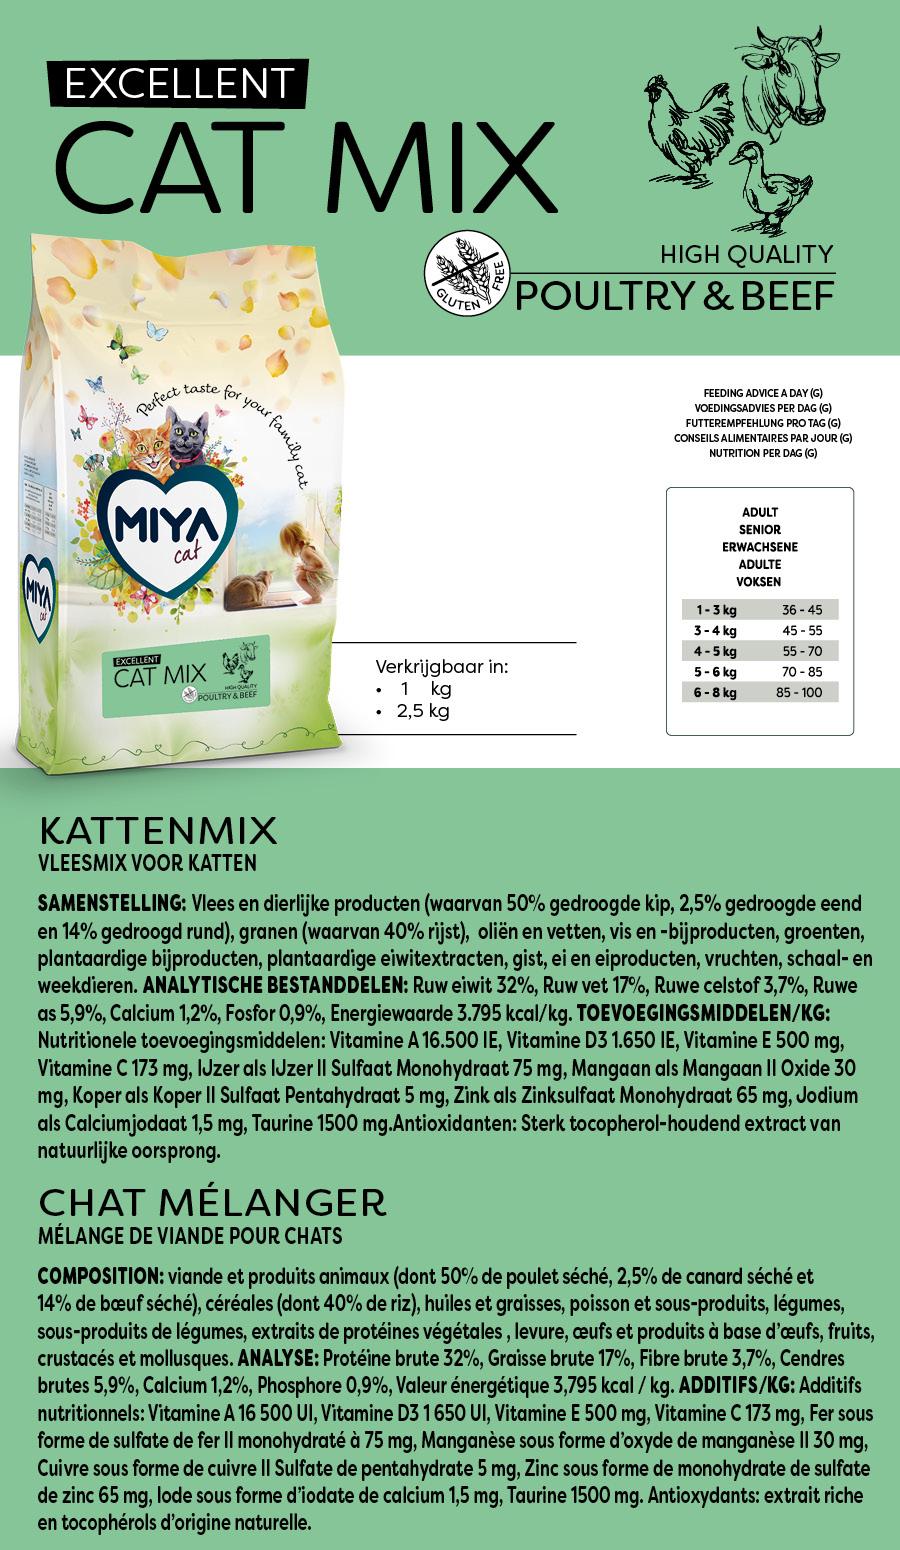 Miya Cat Cat Mix